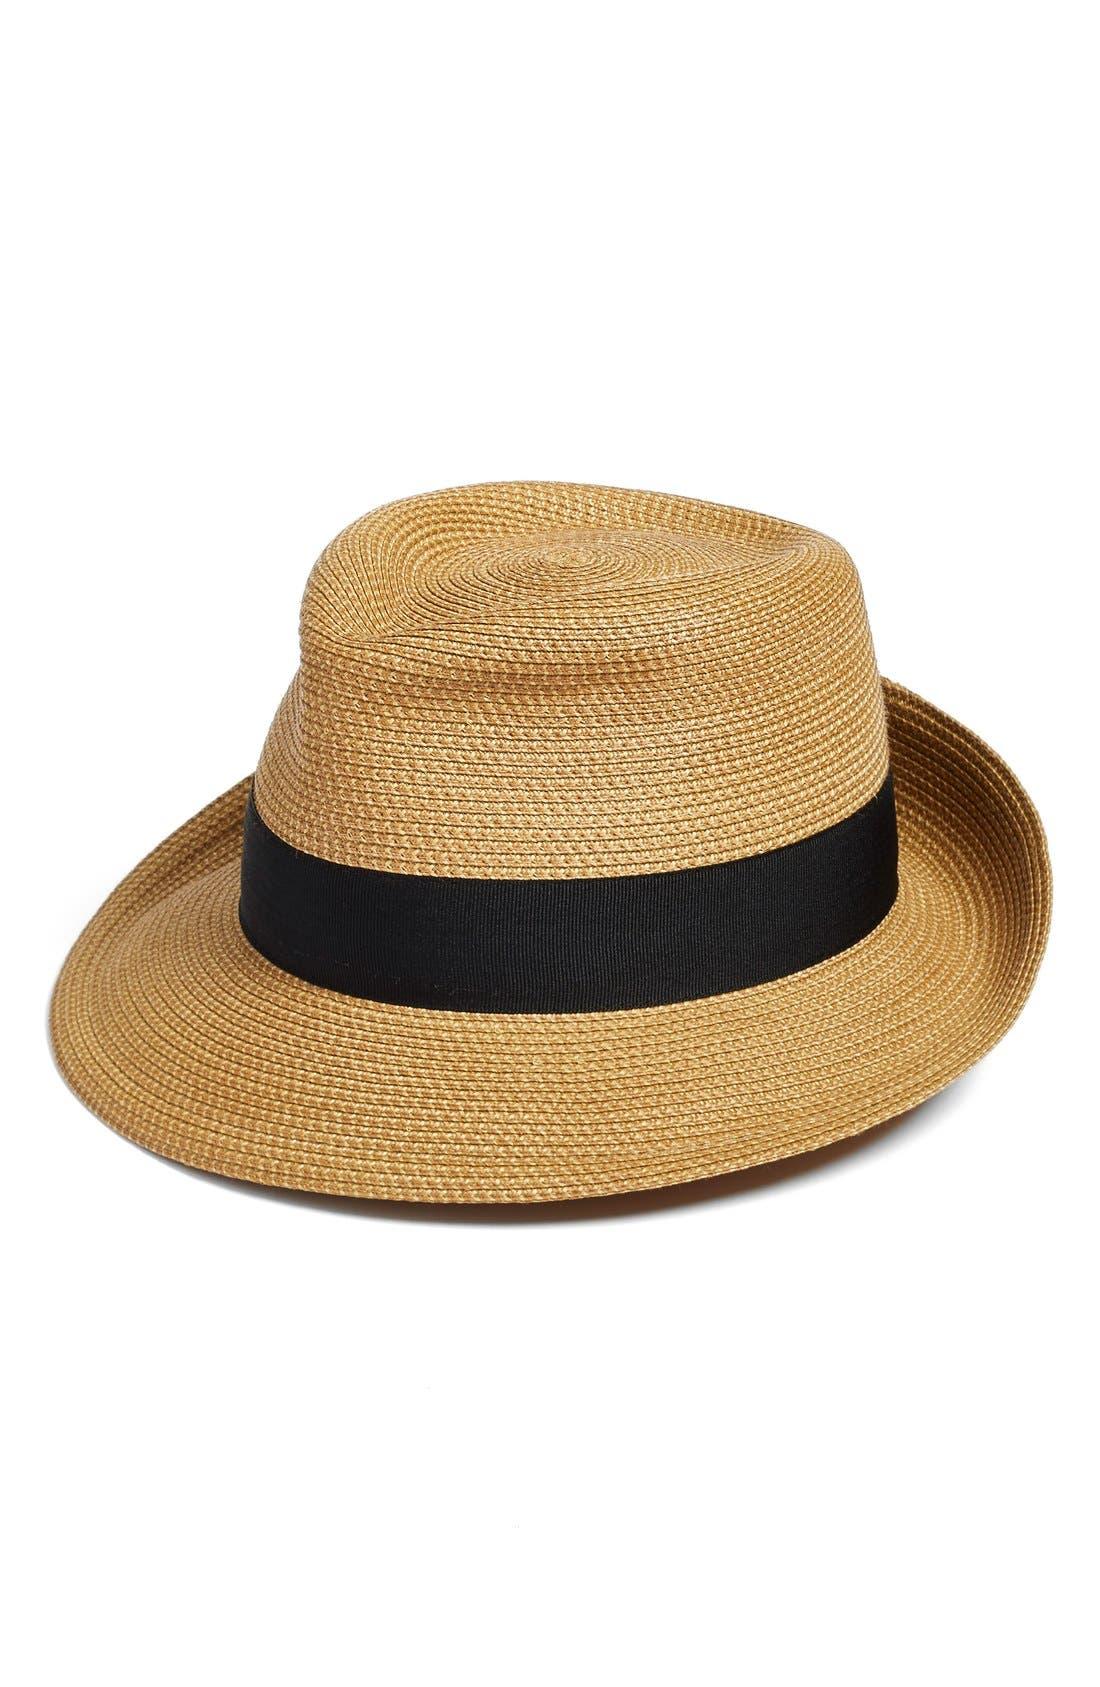 'Classic' Squishee Packable Fedora Sun Hat